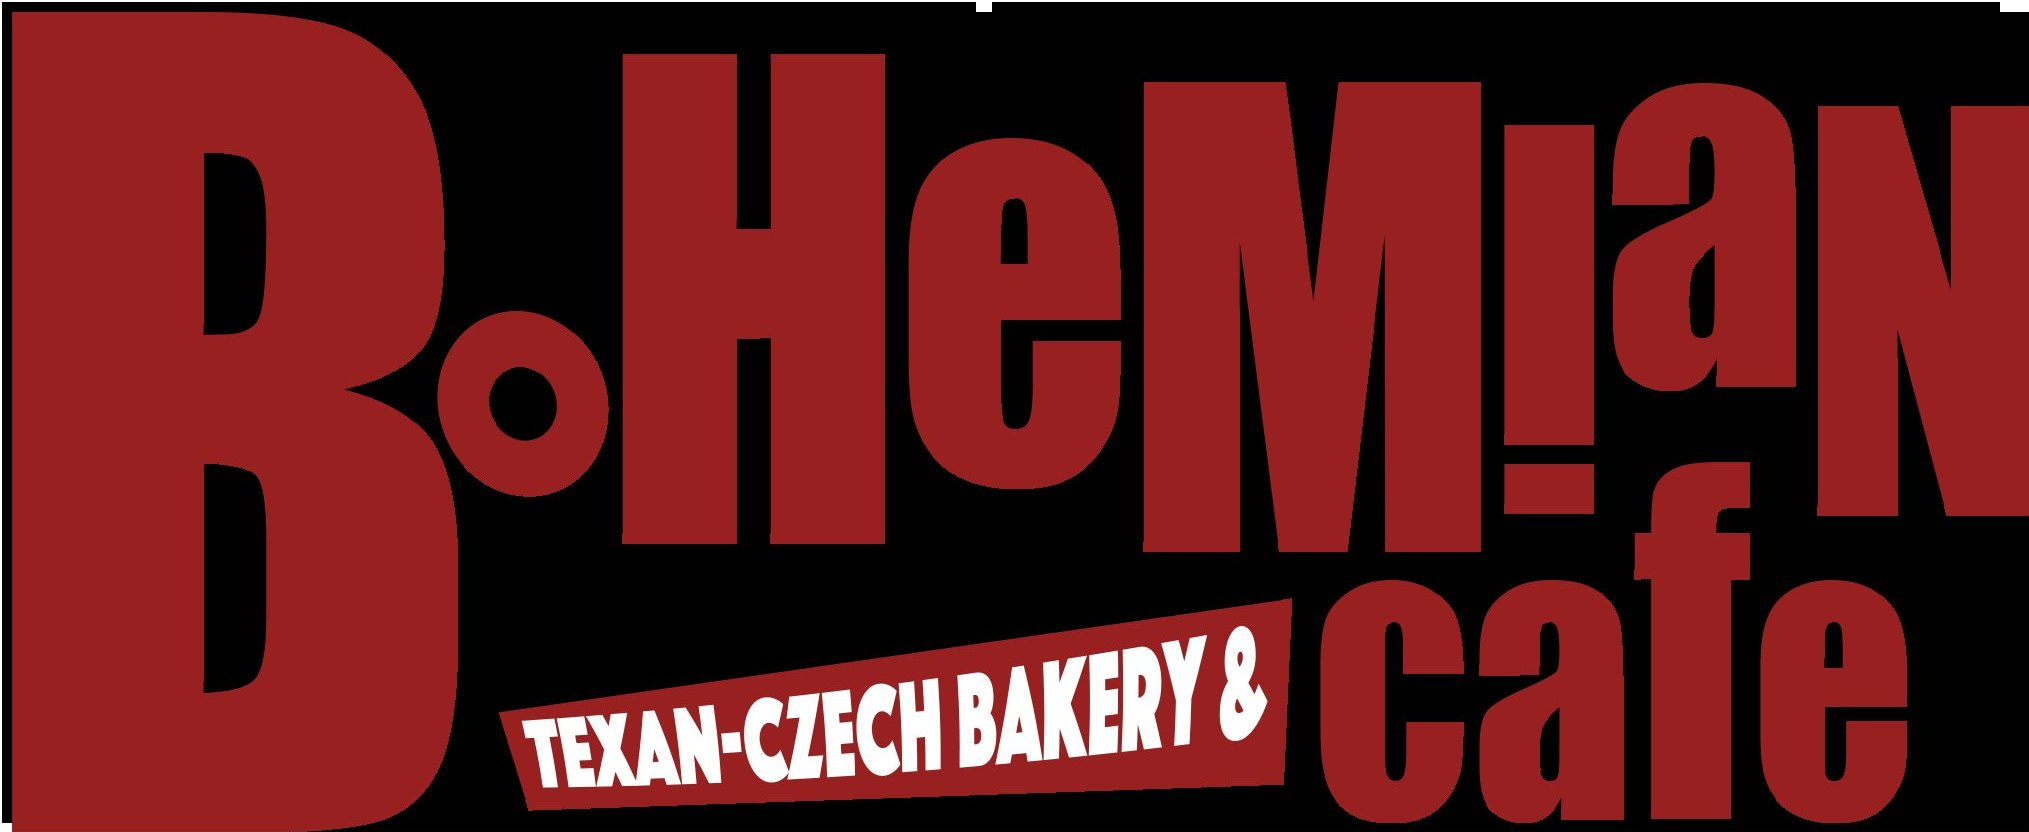 Bohemian Cafe logo - 123755 Bytes